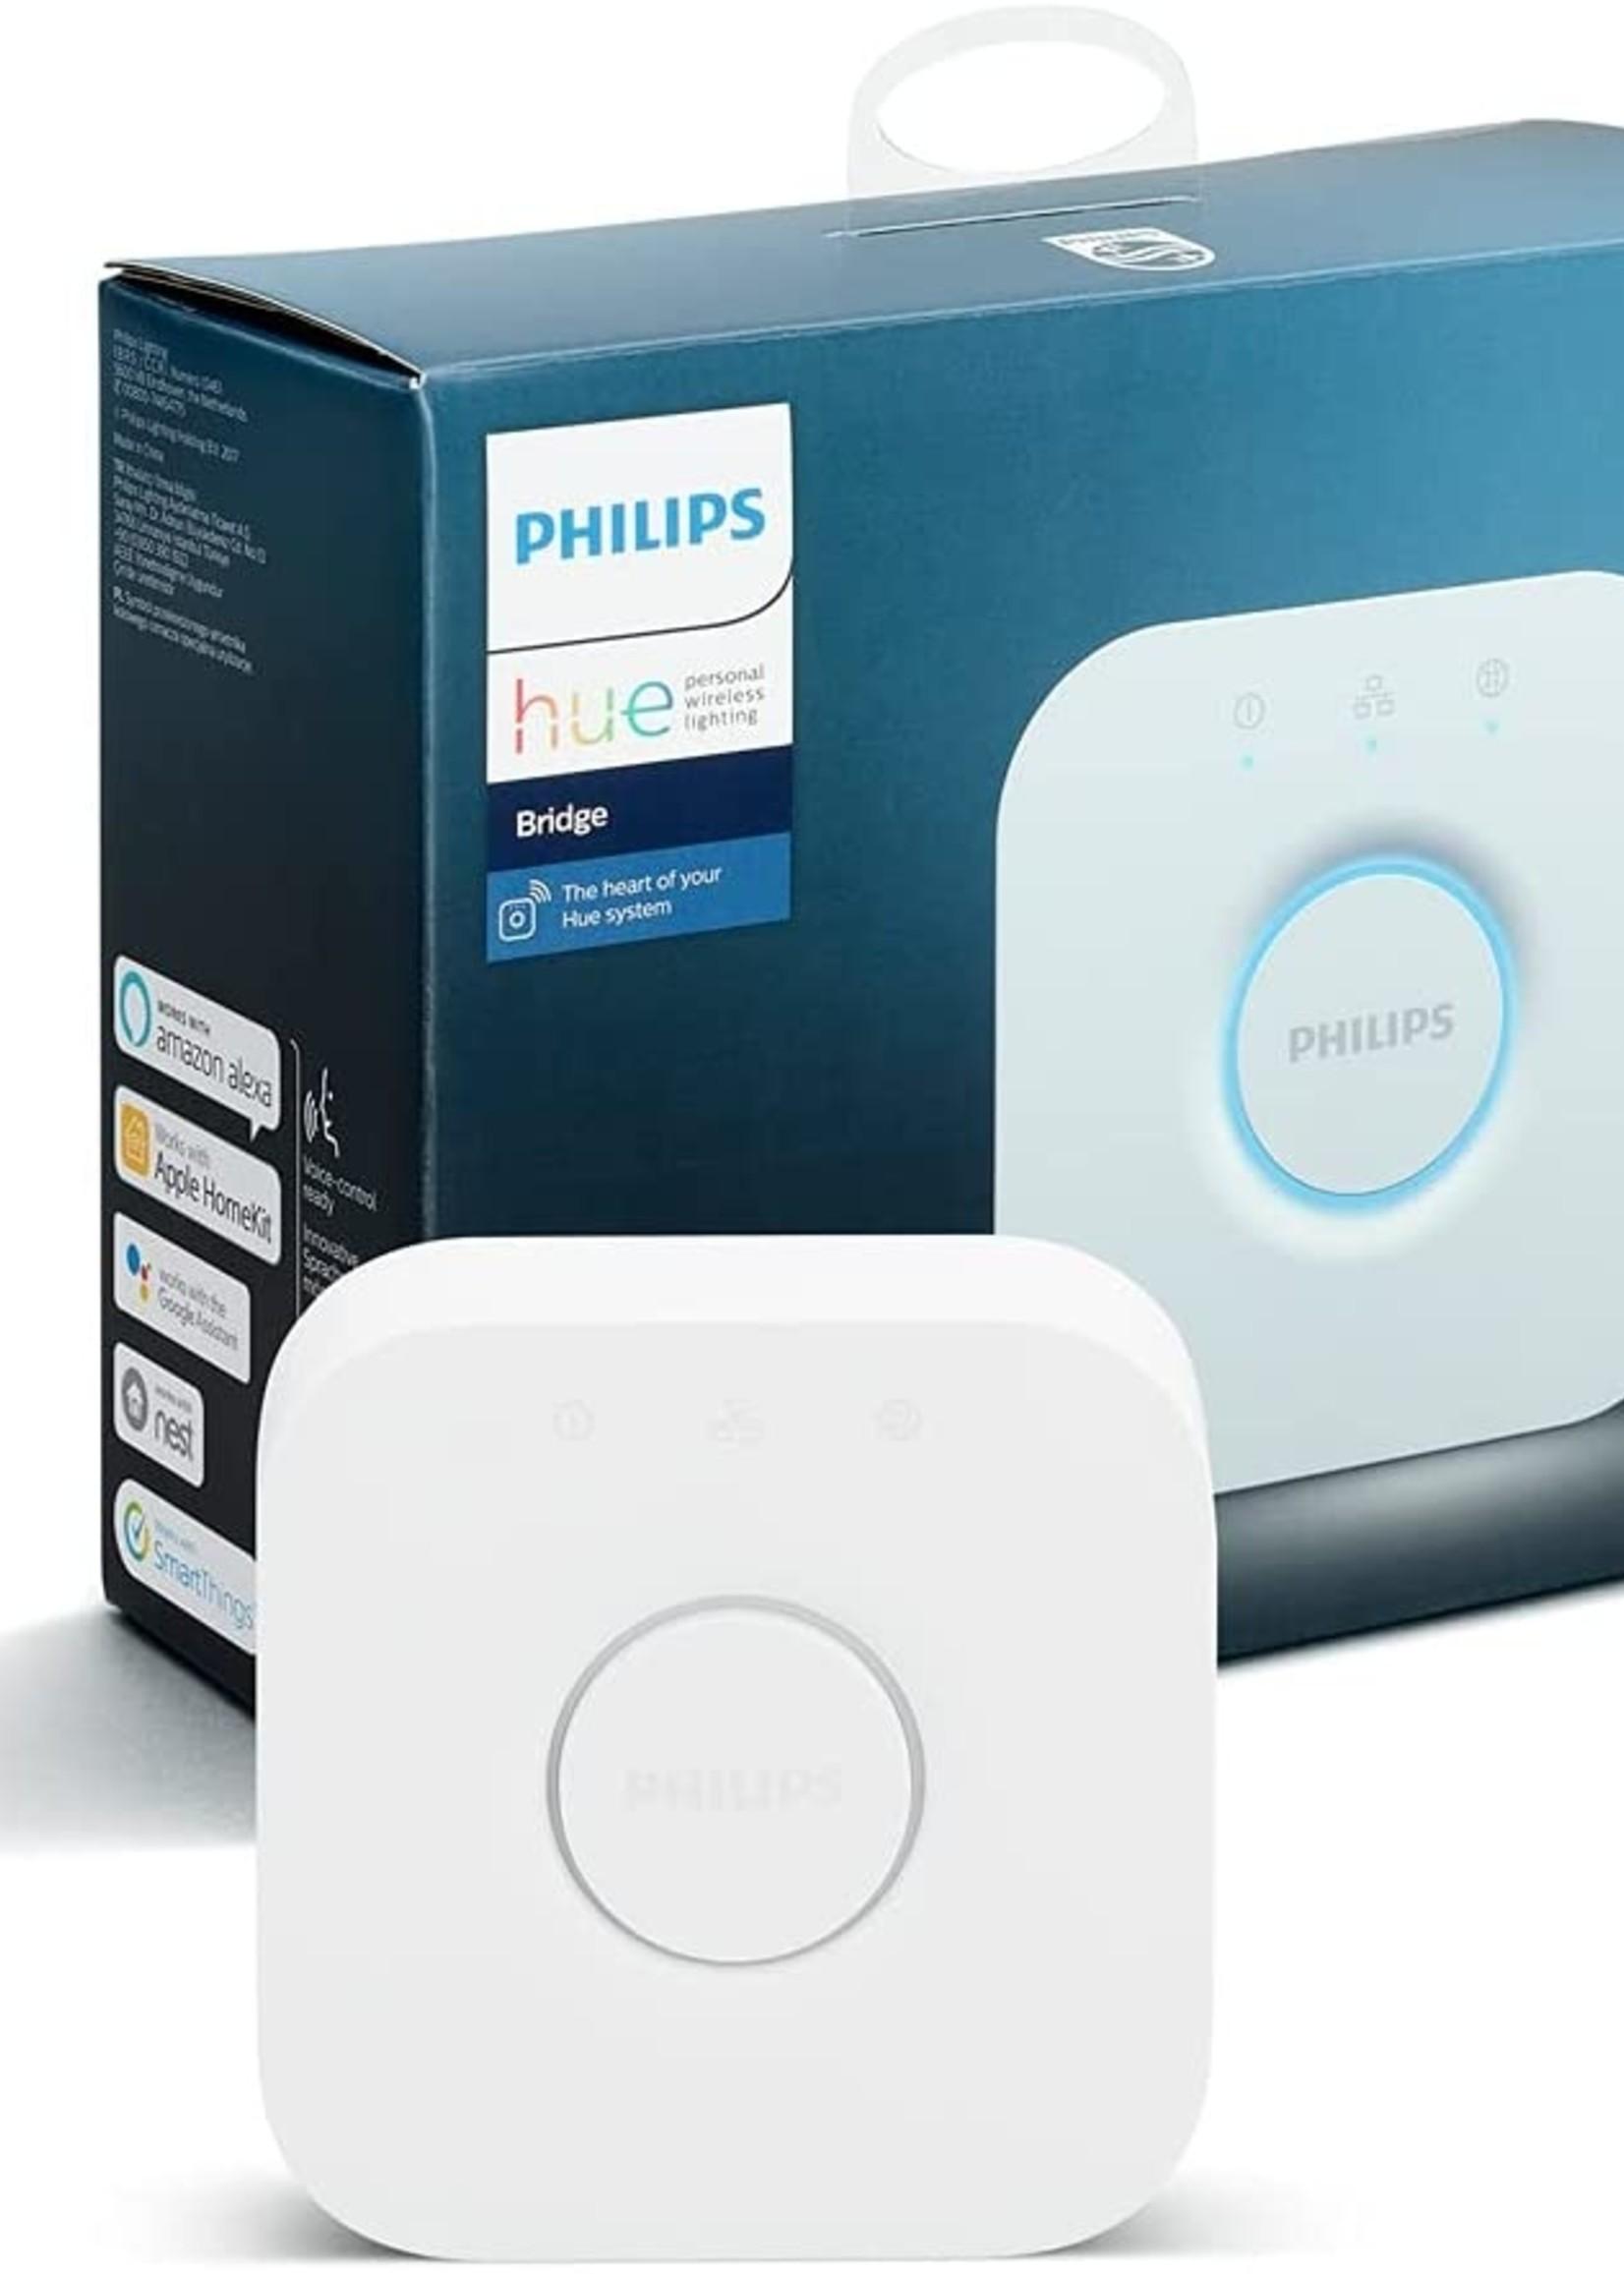 Philips Philips Hue Smart Hub